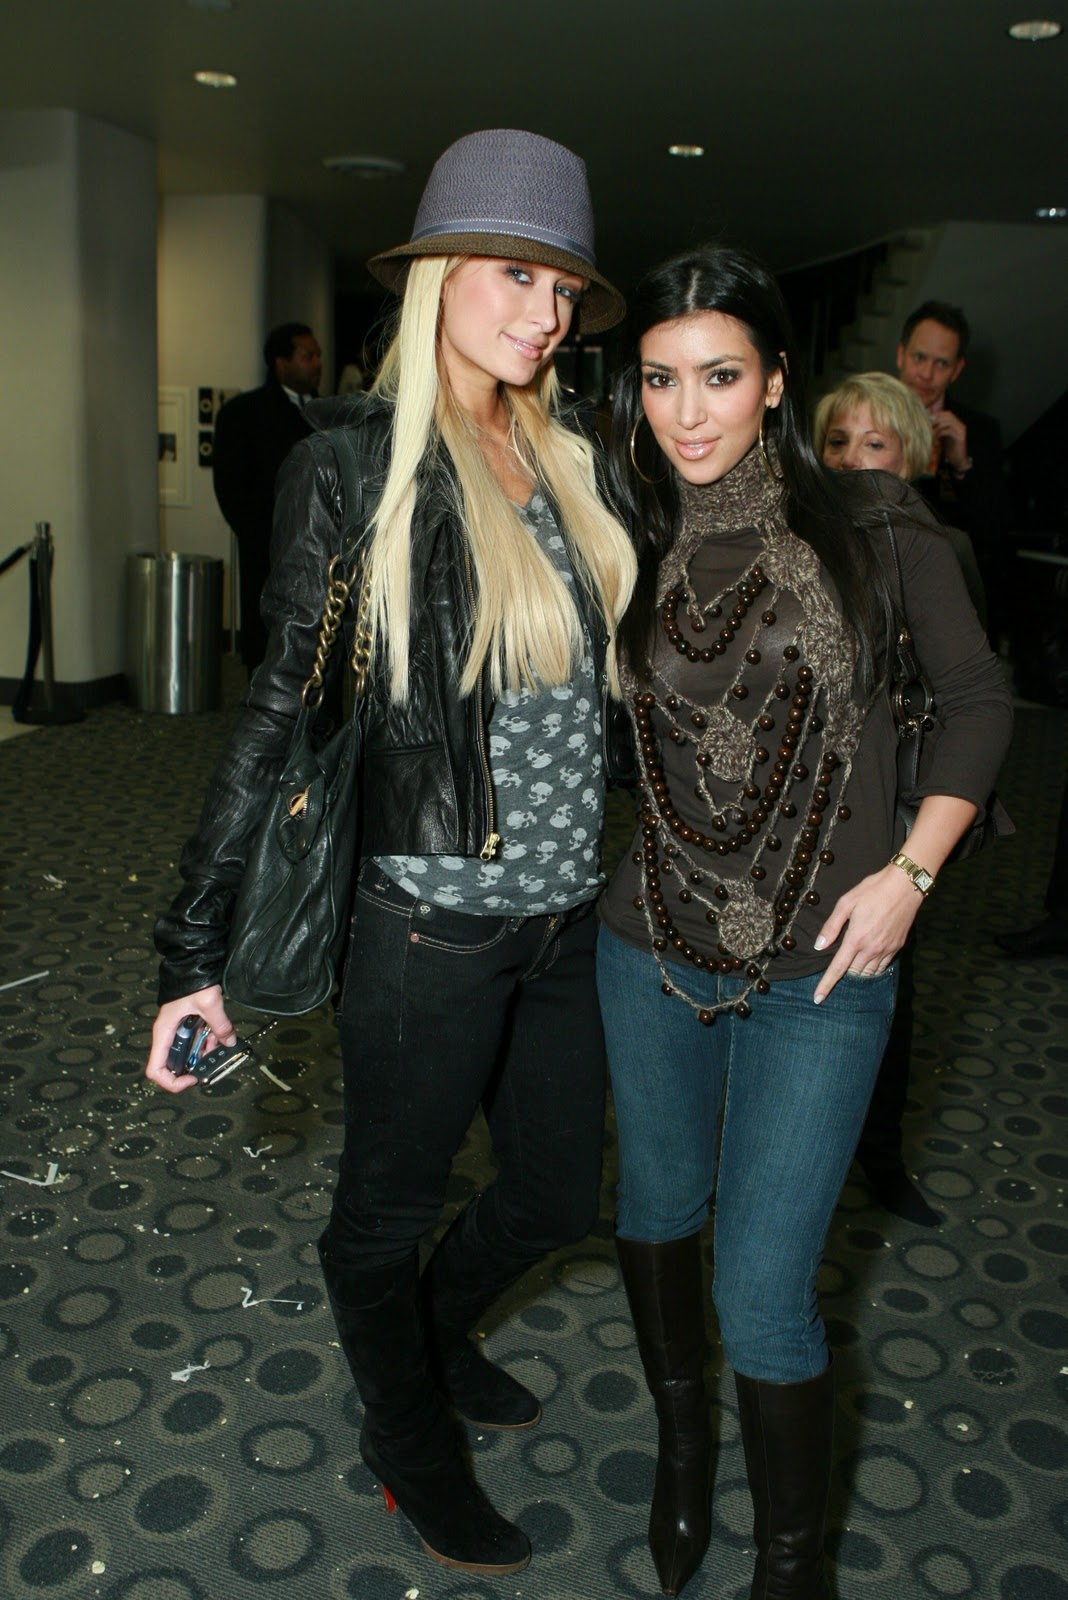 http://4.bp.blogspot.com/_LRzFEyAOGAA/TQnLM_FWRqI/AAAAAAAAD0E/6O9hPWHVPjQ/s1600/43663_Paris_Hilton_and_Kim_Kardashian_02_122_387lo.jpg